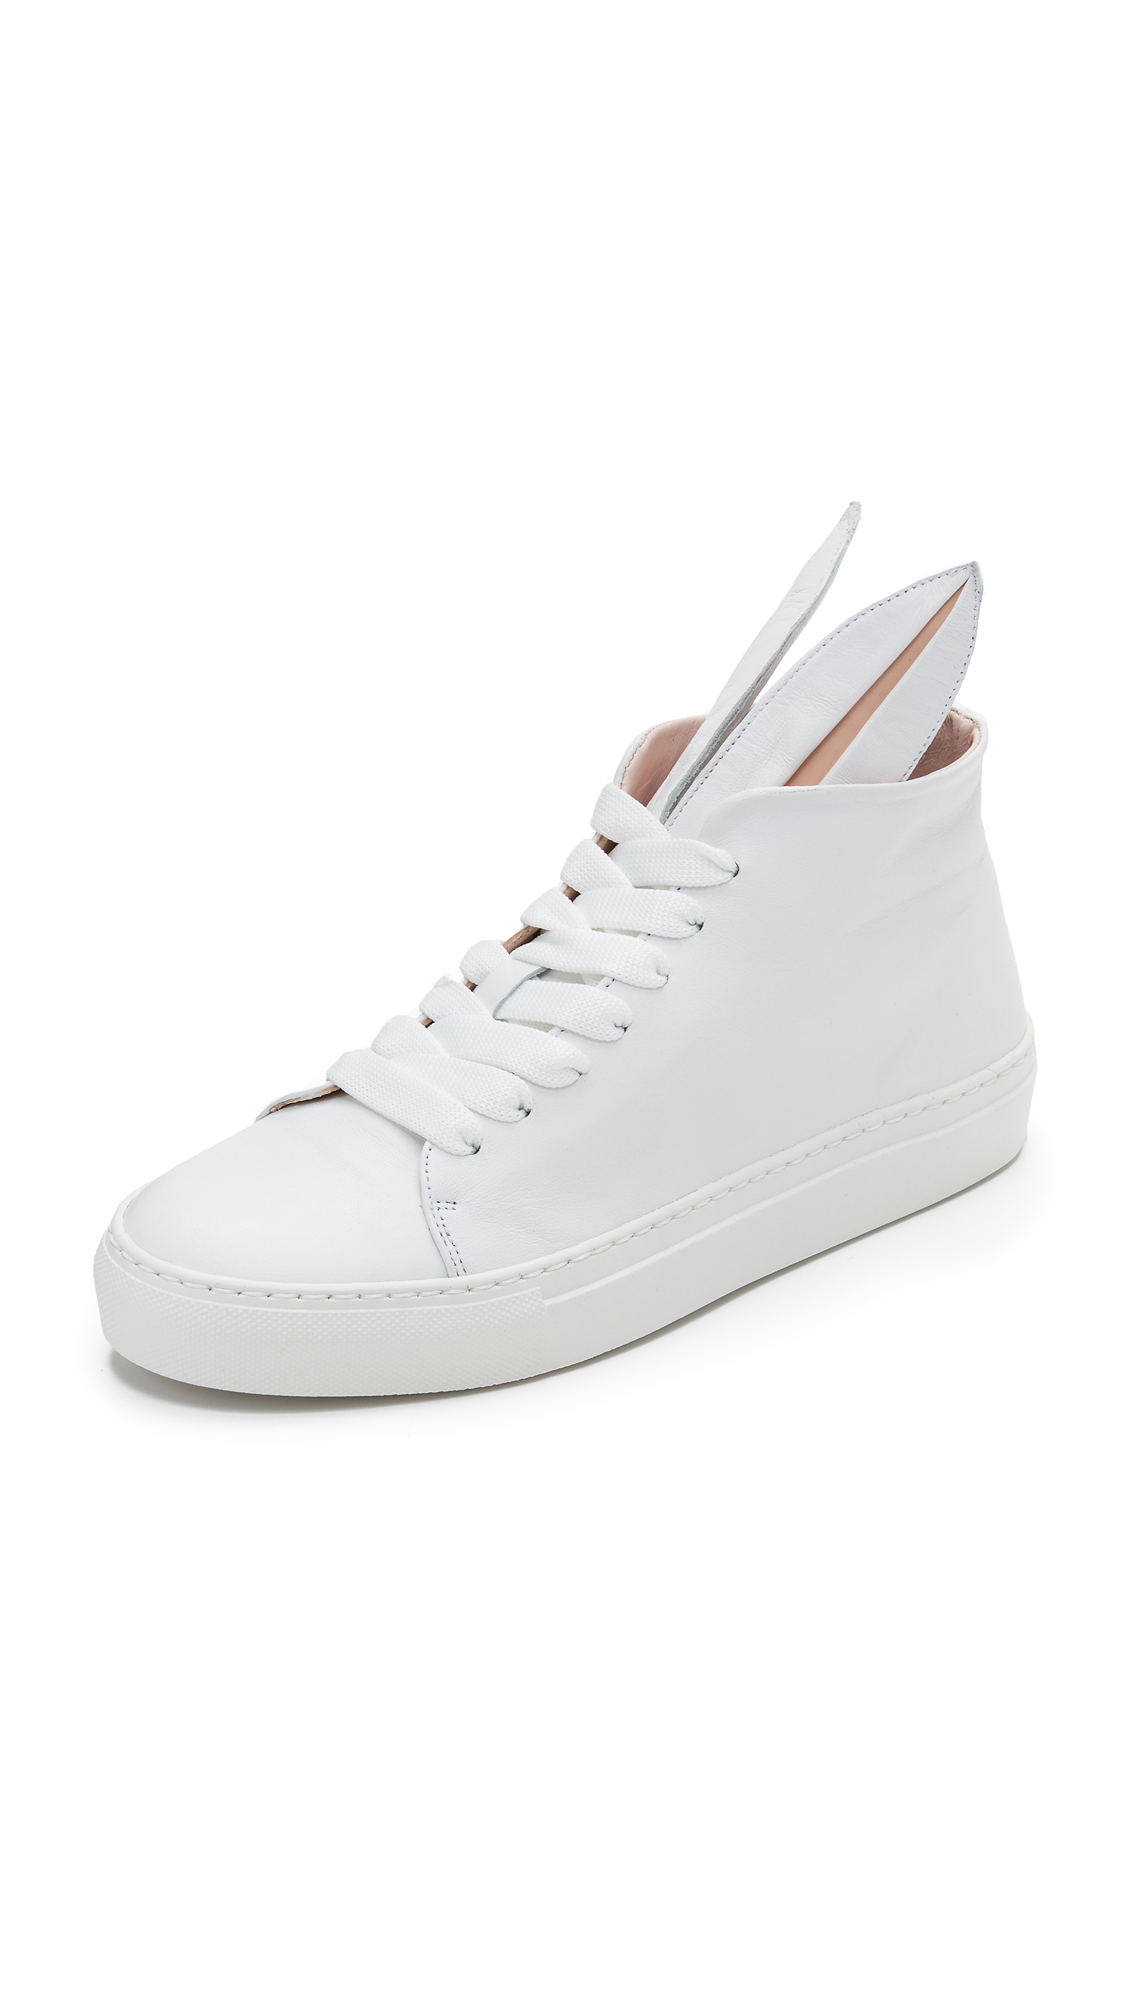 Minna Parikka Bunny Sneakers - White